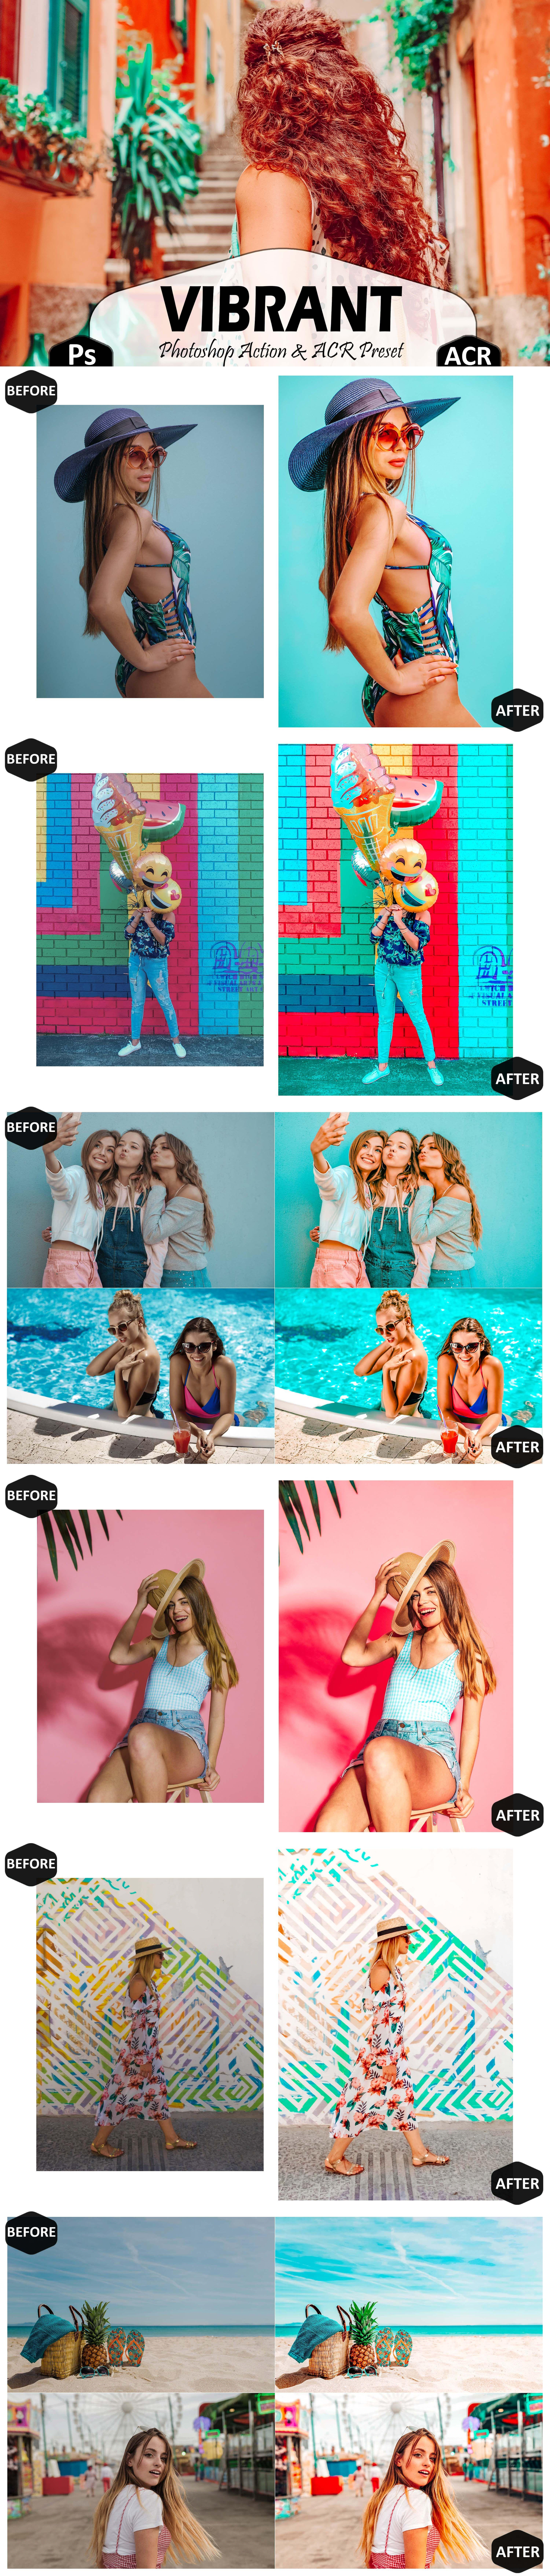 how to add image to pdf adobe acrobat pro